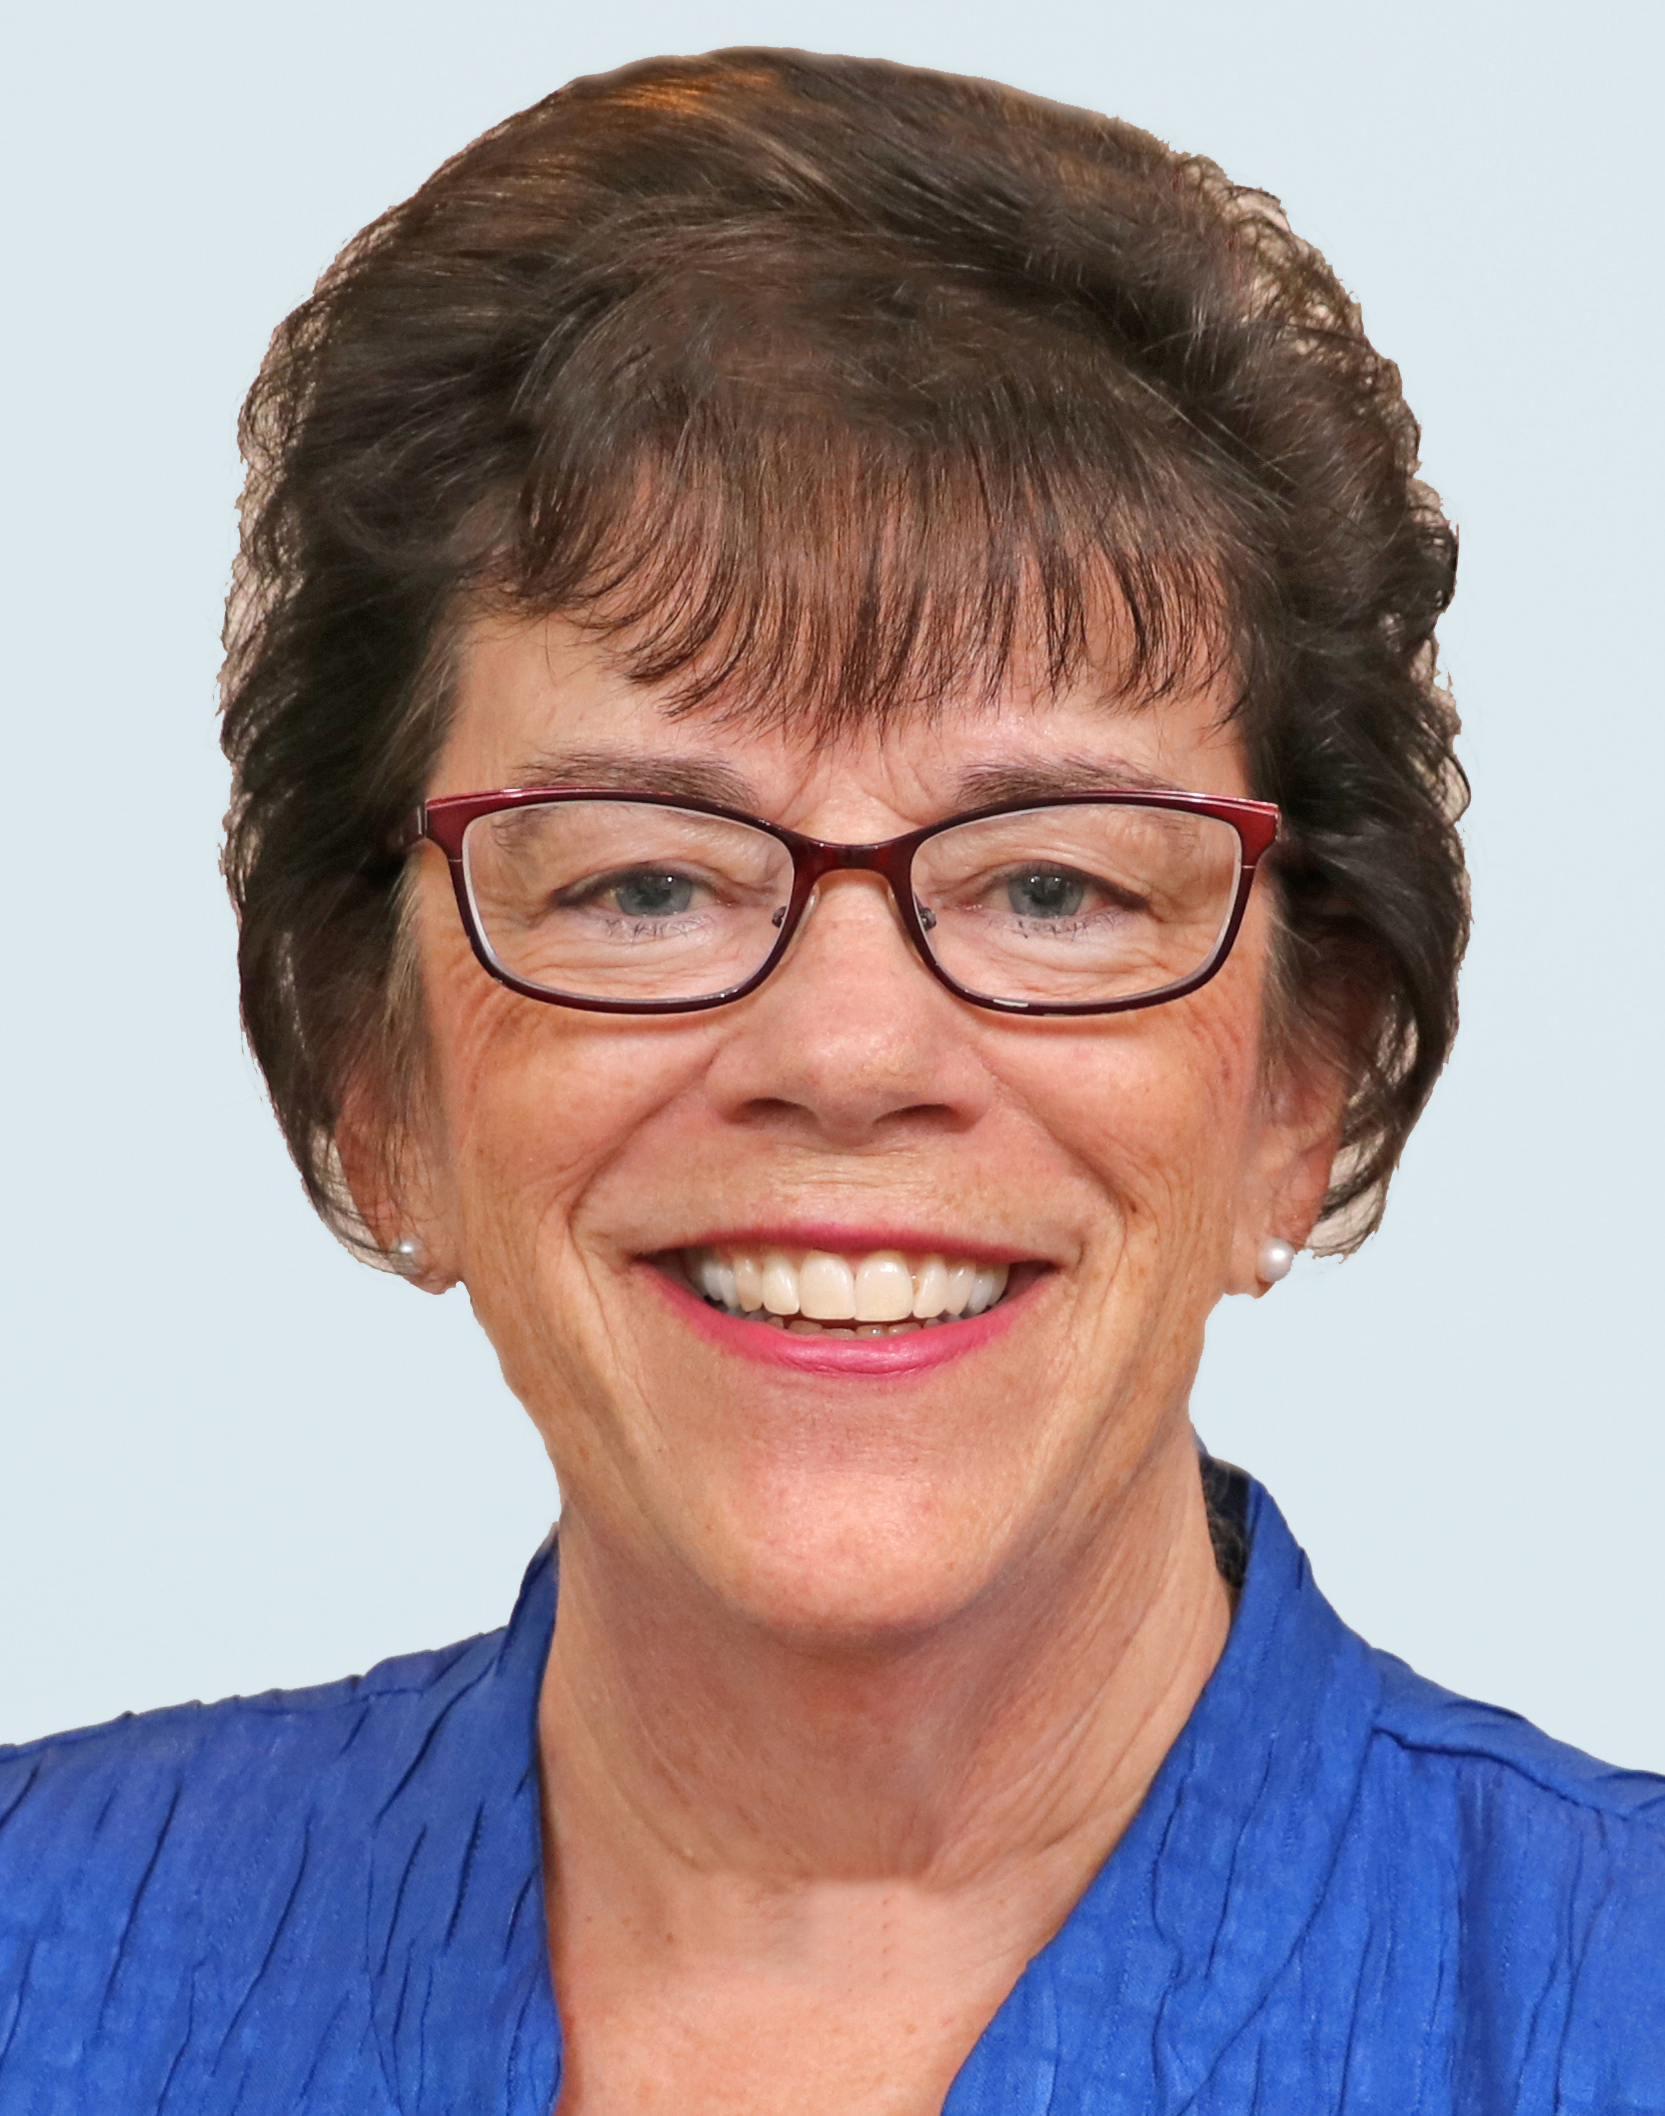 Maureen Reynolds